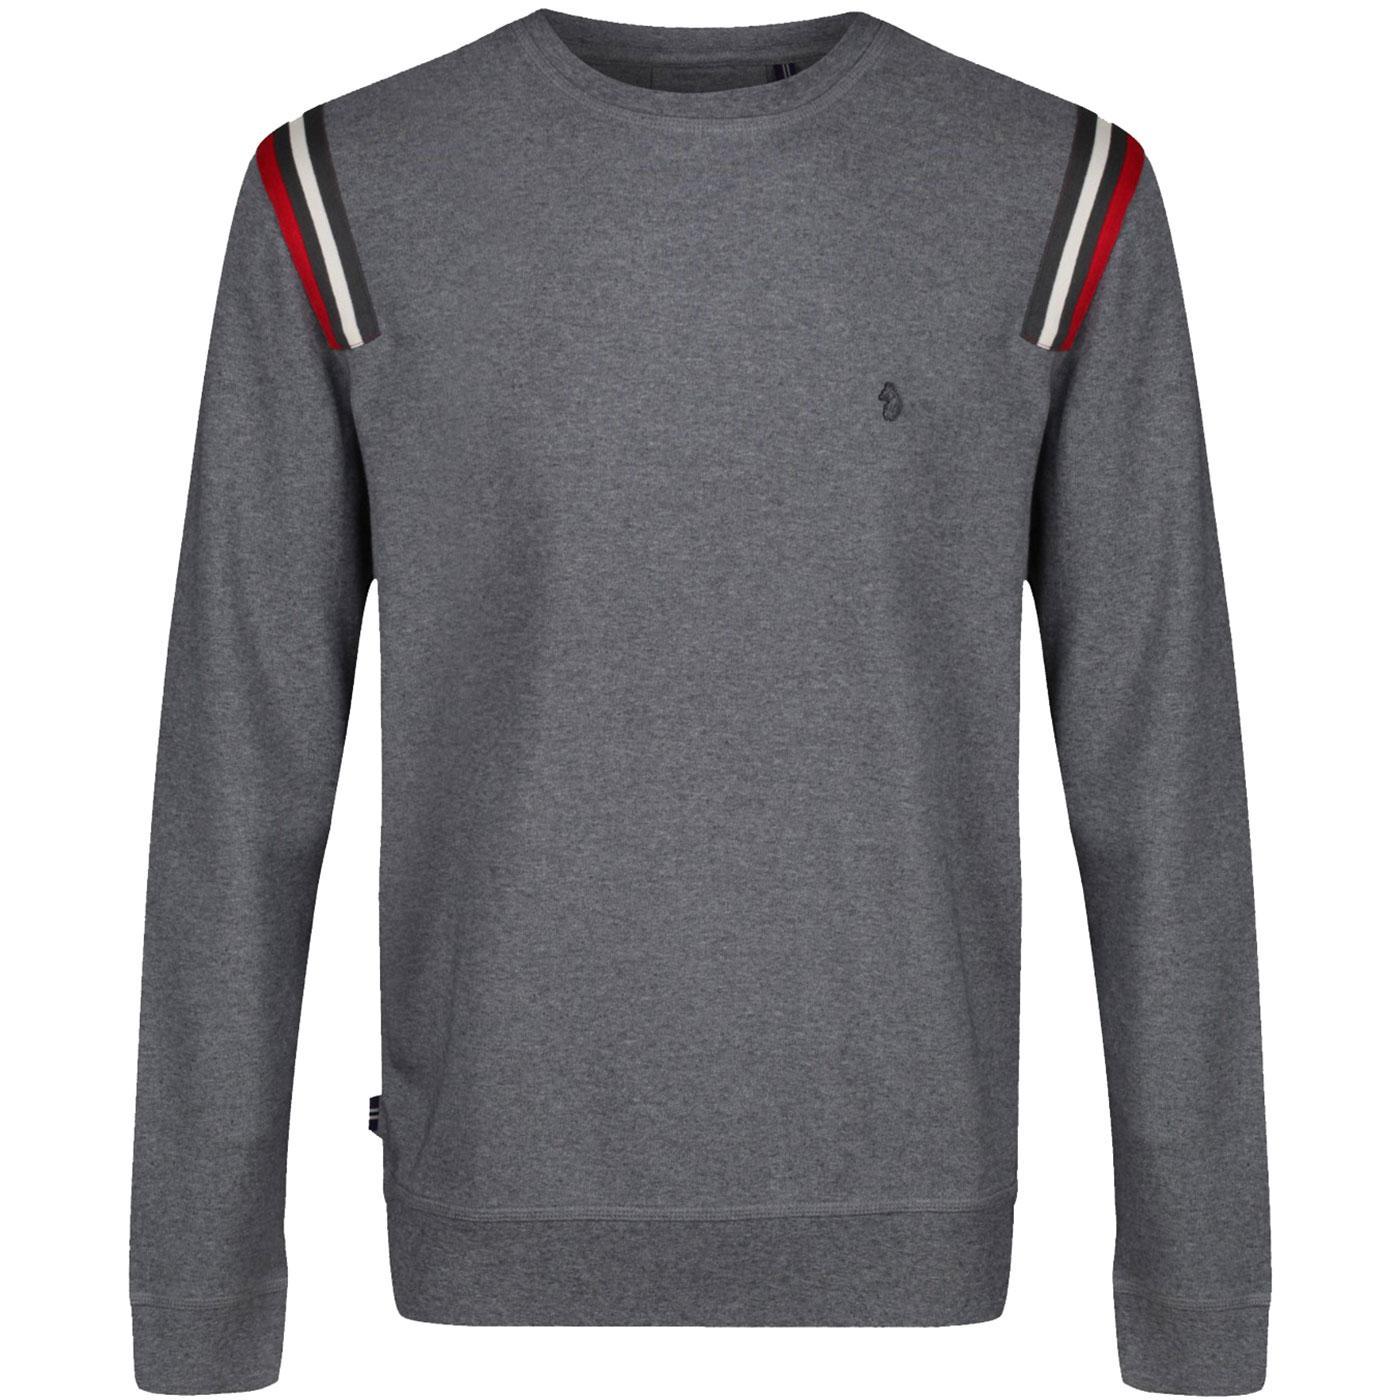 Palma LUKE Retro Shoulder Stripe Tape Sweatshirt